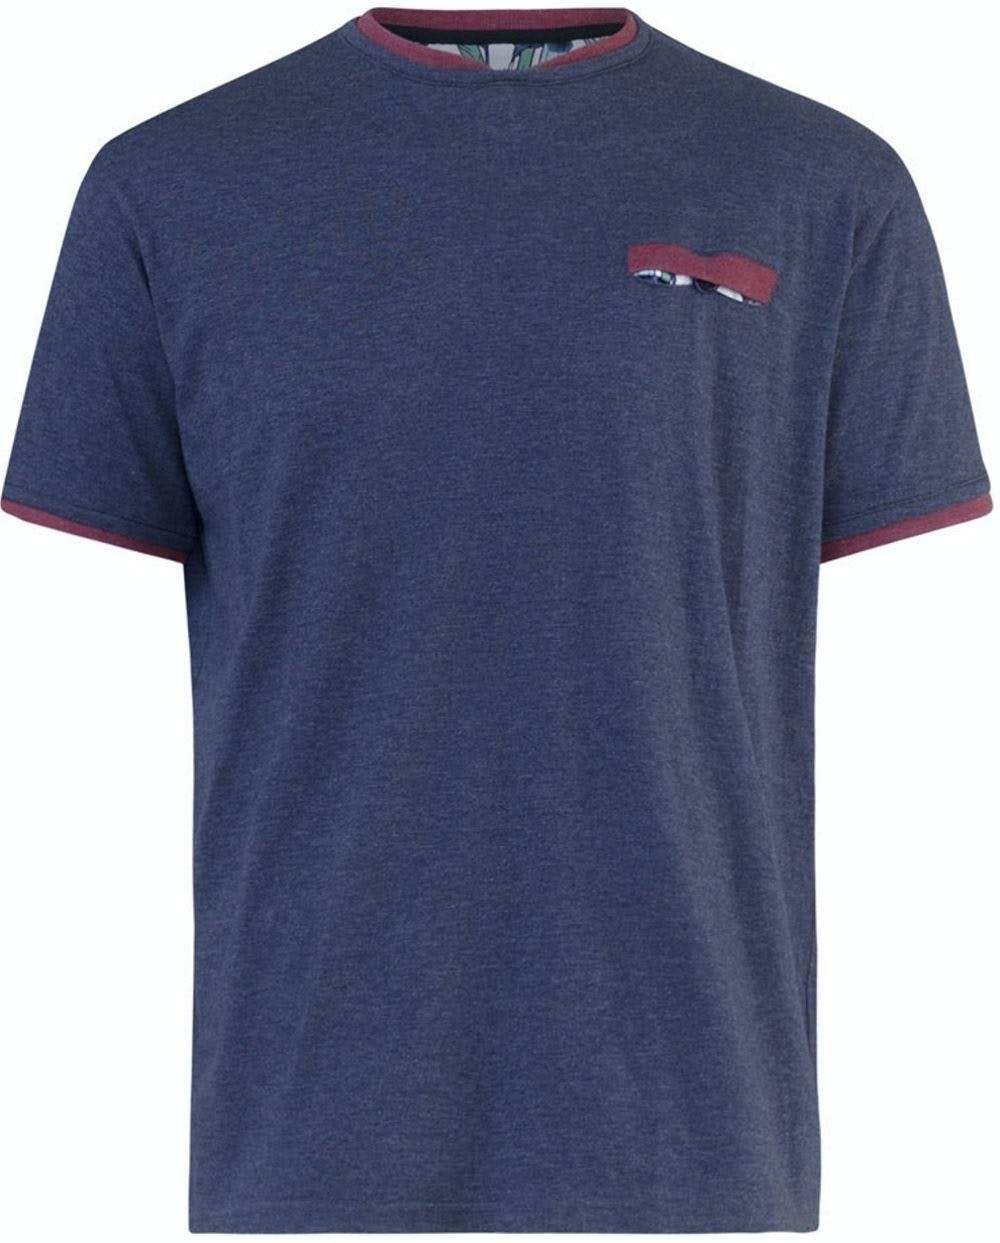 D555 Nelly Double Layer Neck & Pocket T-Shirt Denim